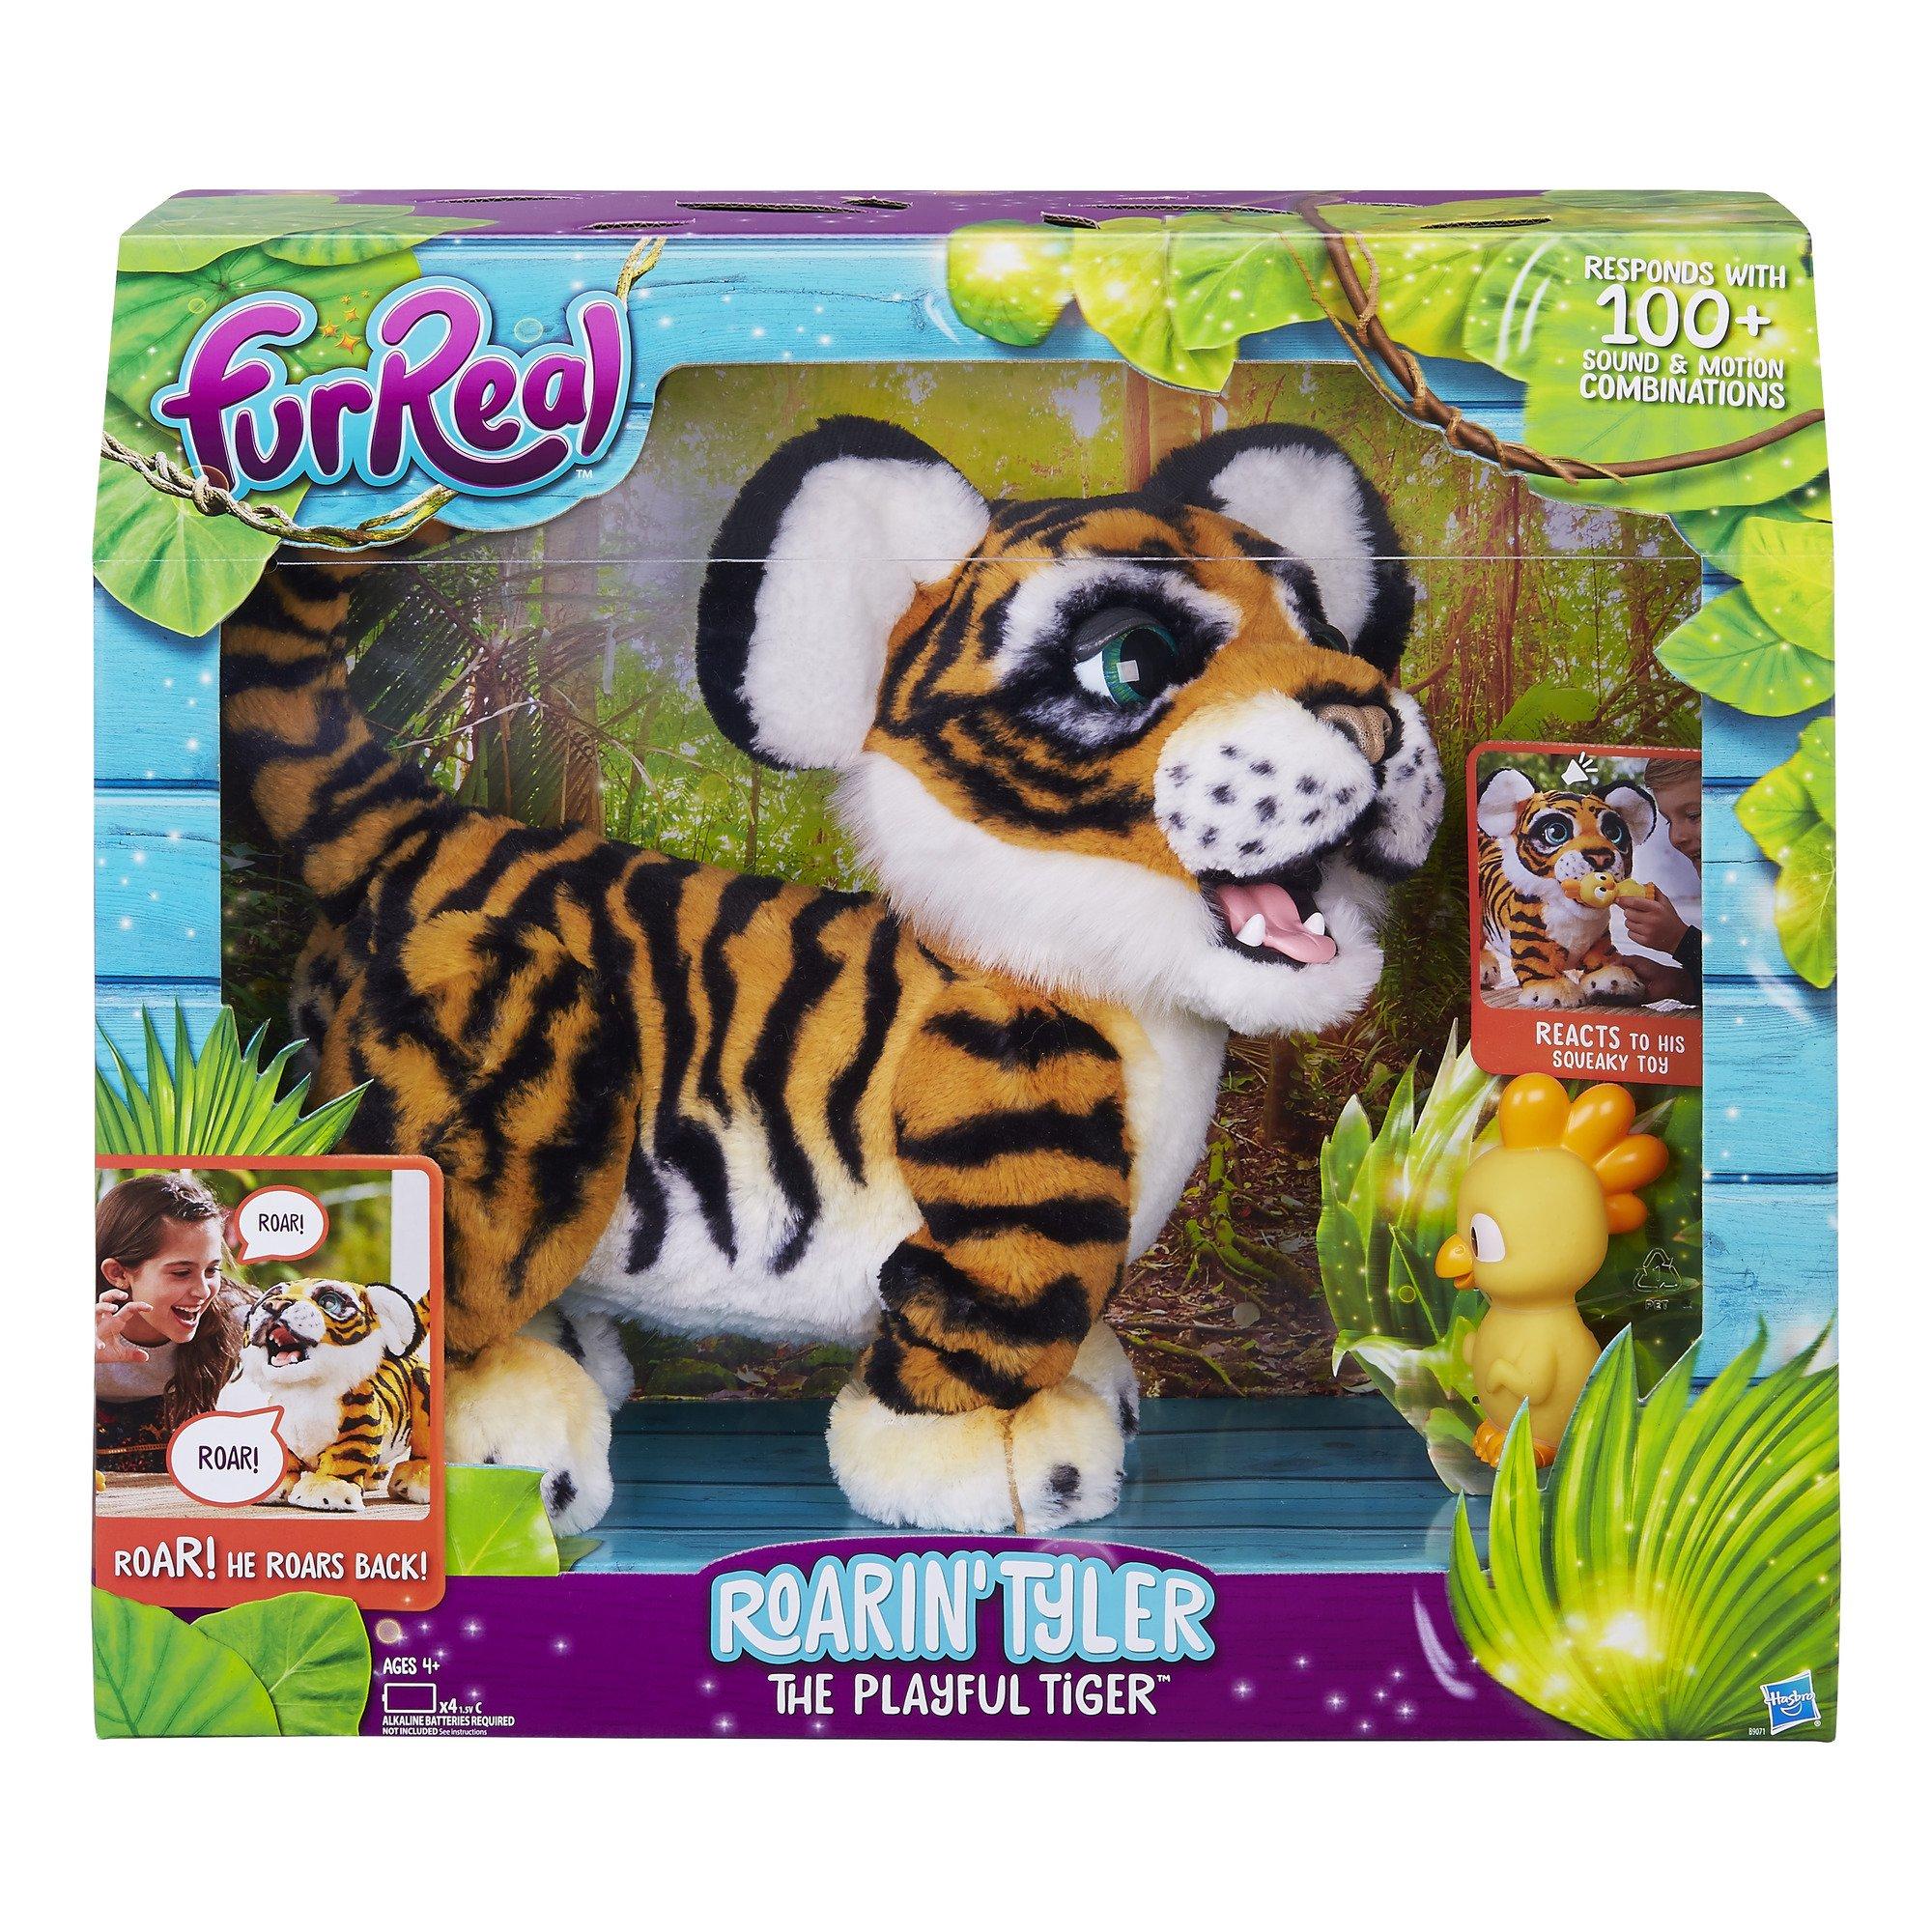 Playful Roarin Tyler Furreal Tiger